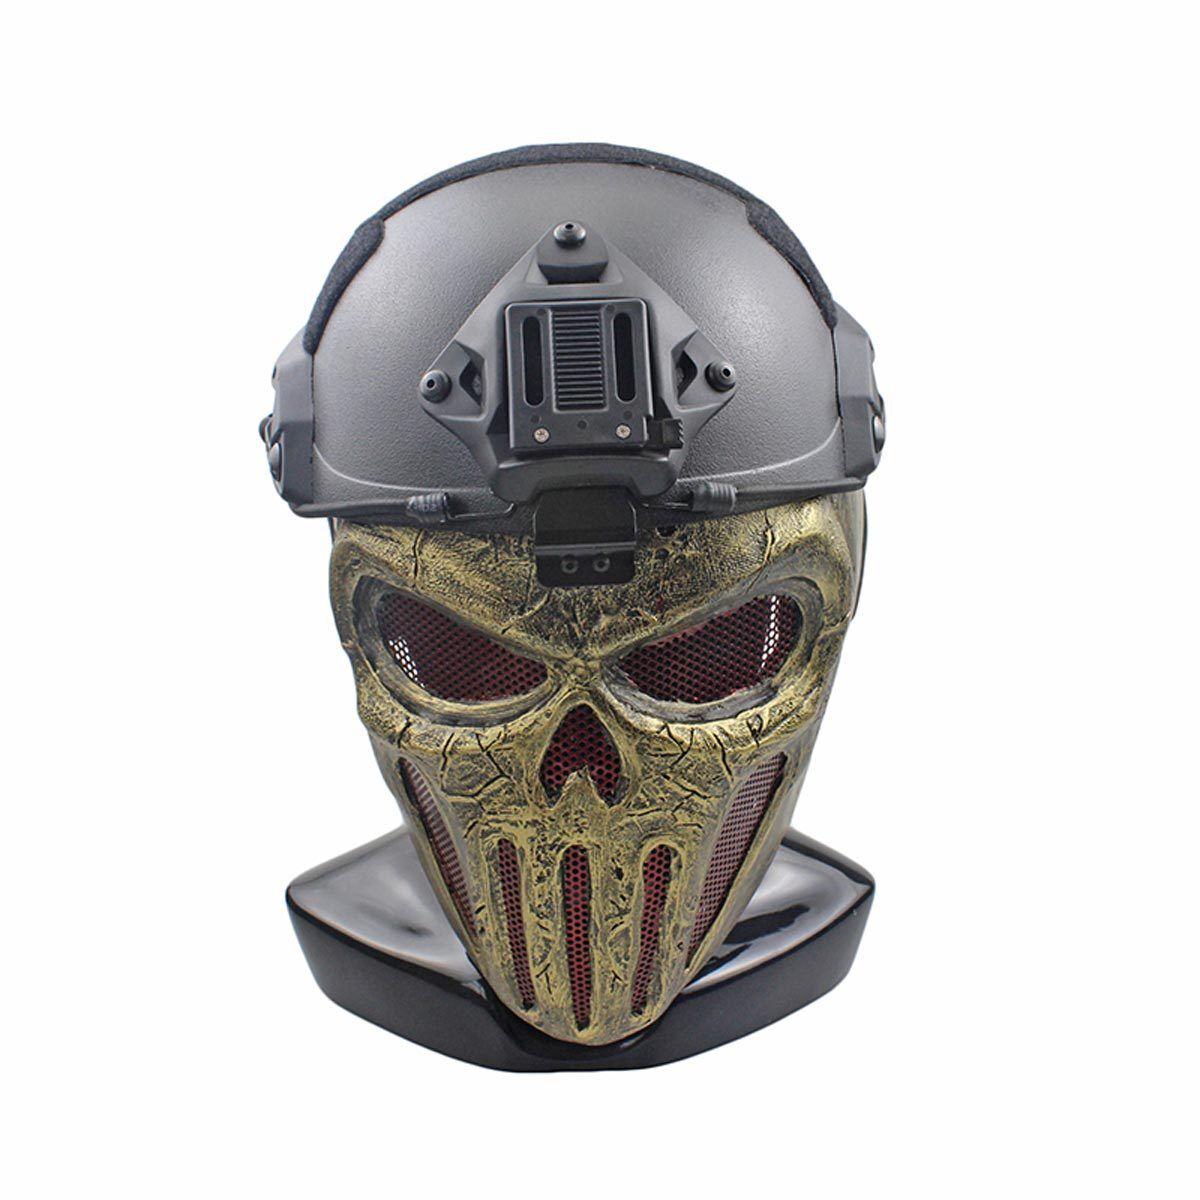 Handmade Wire Mesh Glass Fiber Resin Airsoft CS Half Face mask For Helmet M115